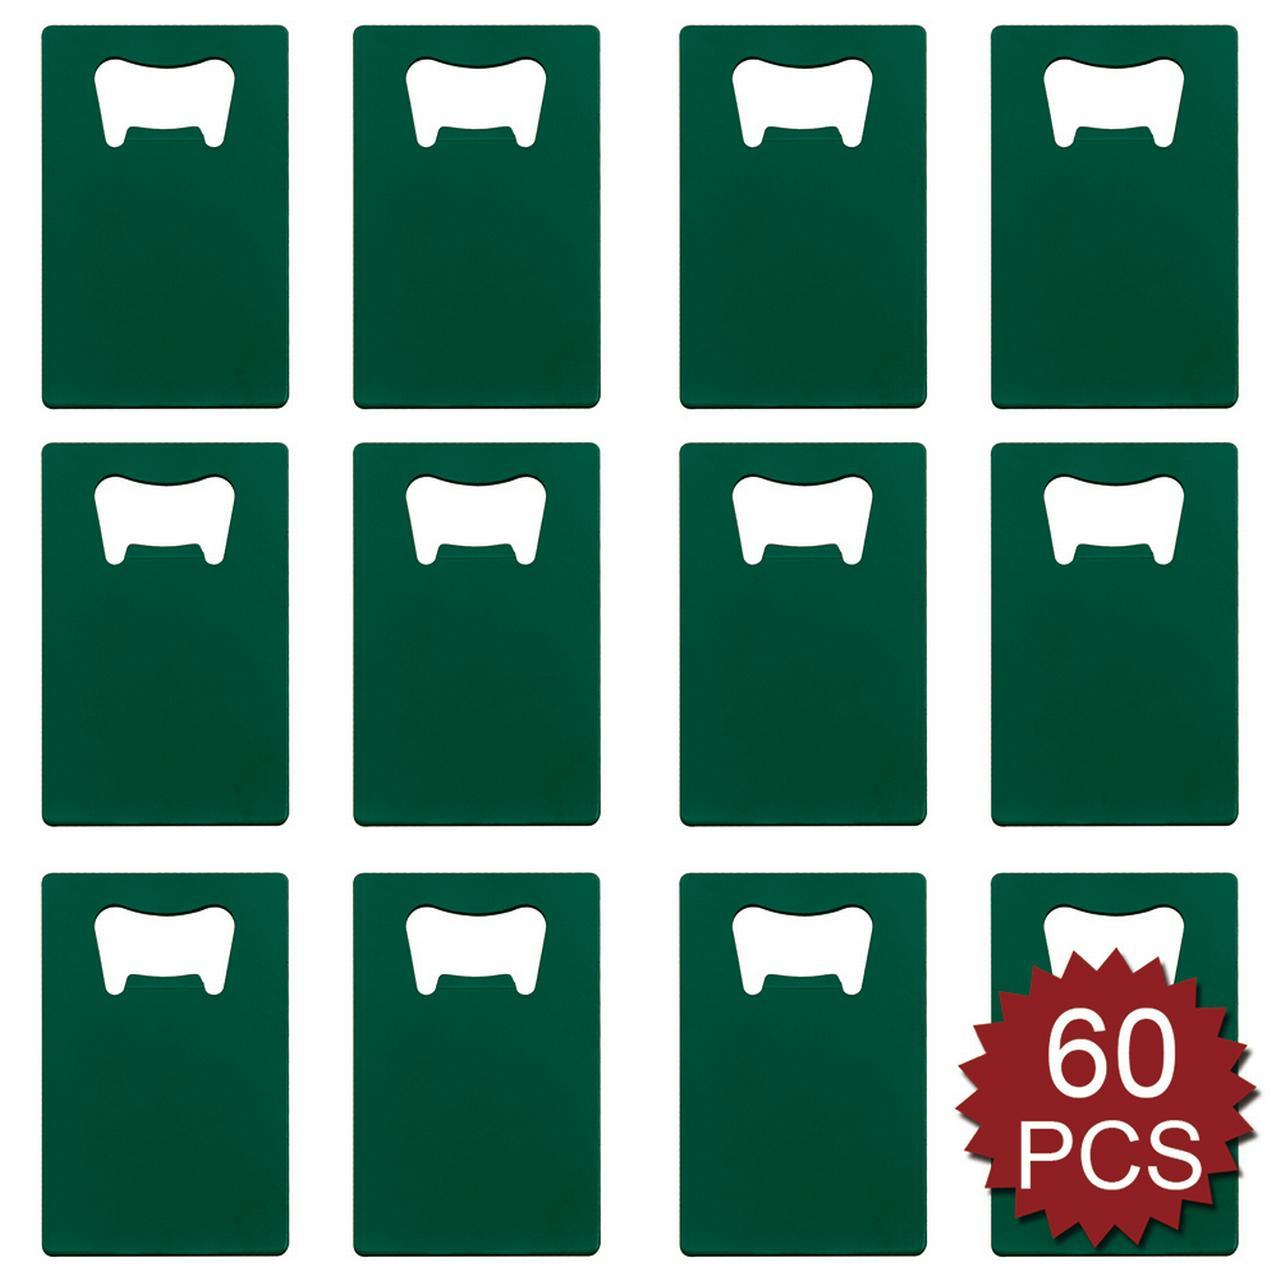 Aspire 60 PCS Credit Card Bottle Opener Fits Wallet, Various Colors